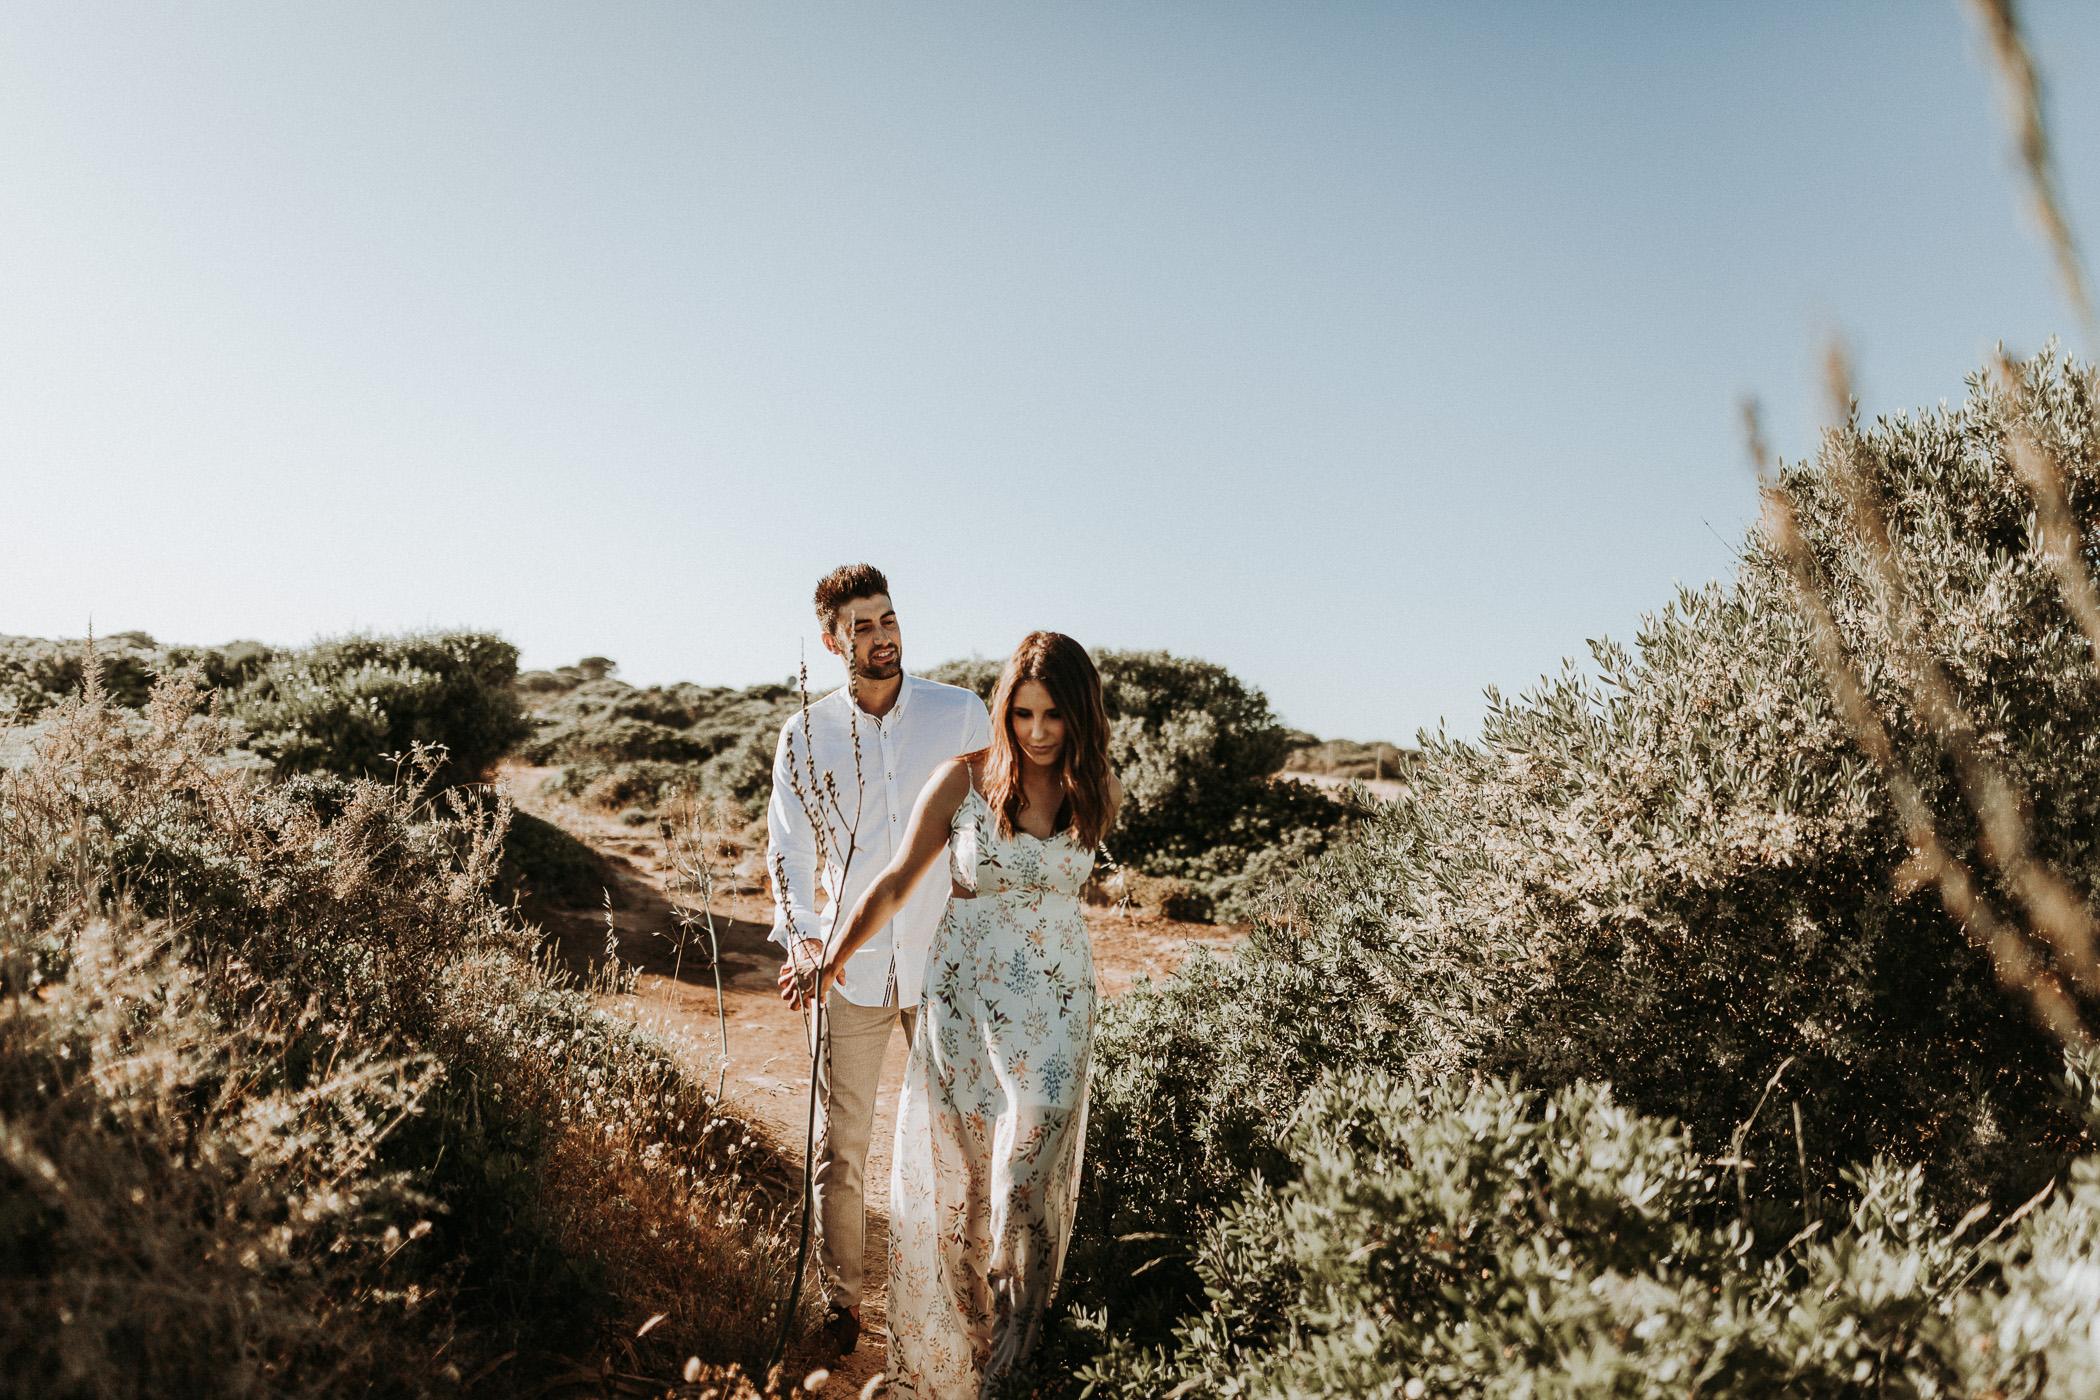 DanielaMarquardtPhotography_wedding_elopement_mallorca_spain_calapi_palma_lauraandtoni_208